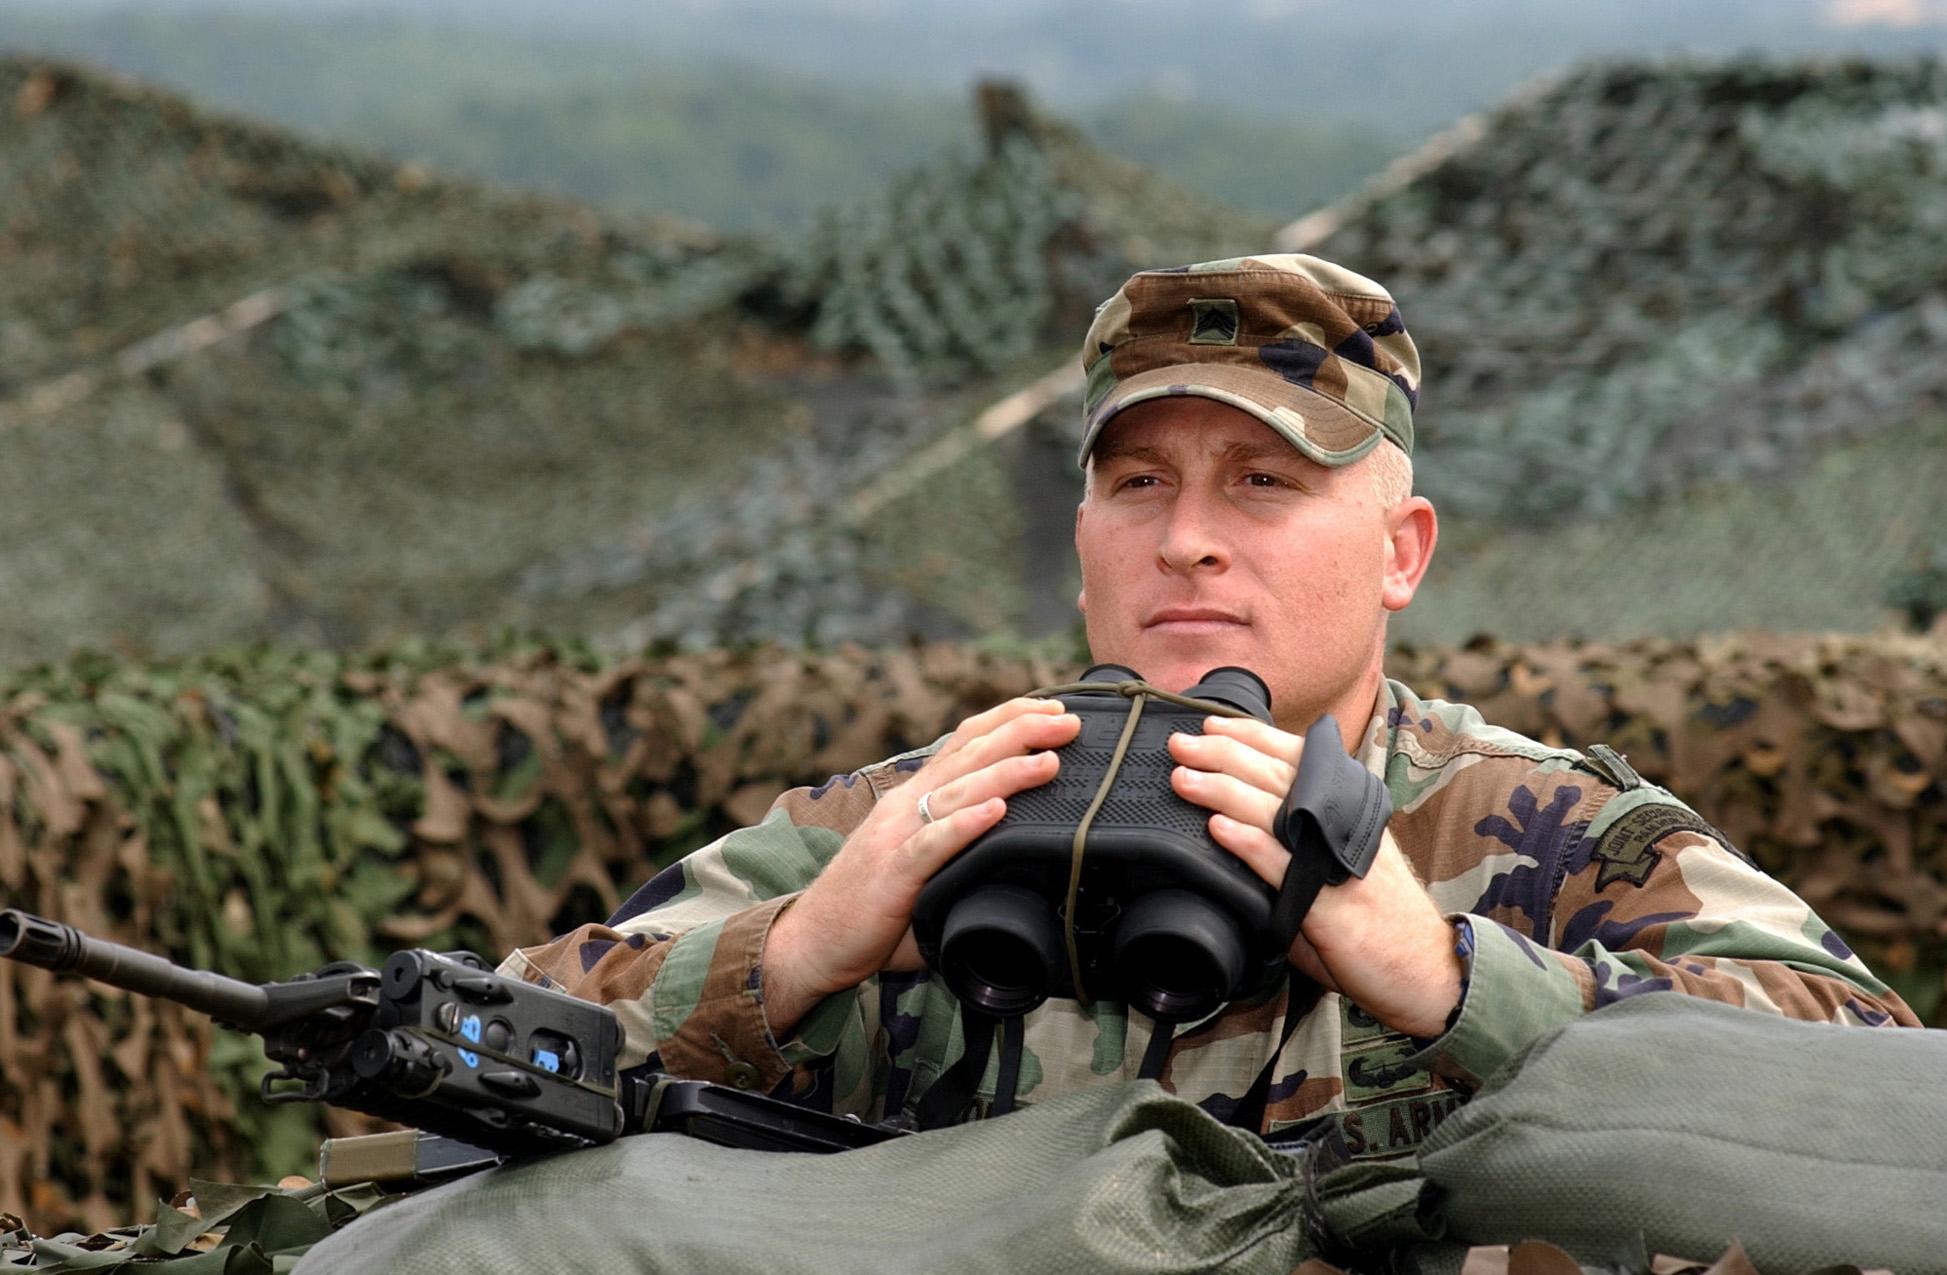 Soldier holding binoculars near the N-S Korean border